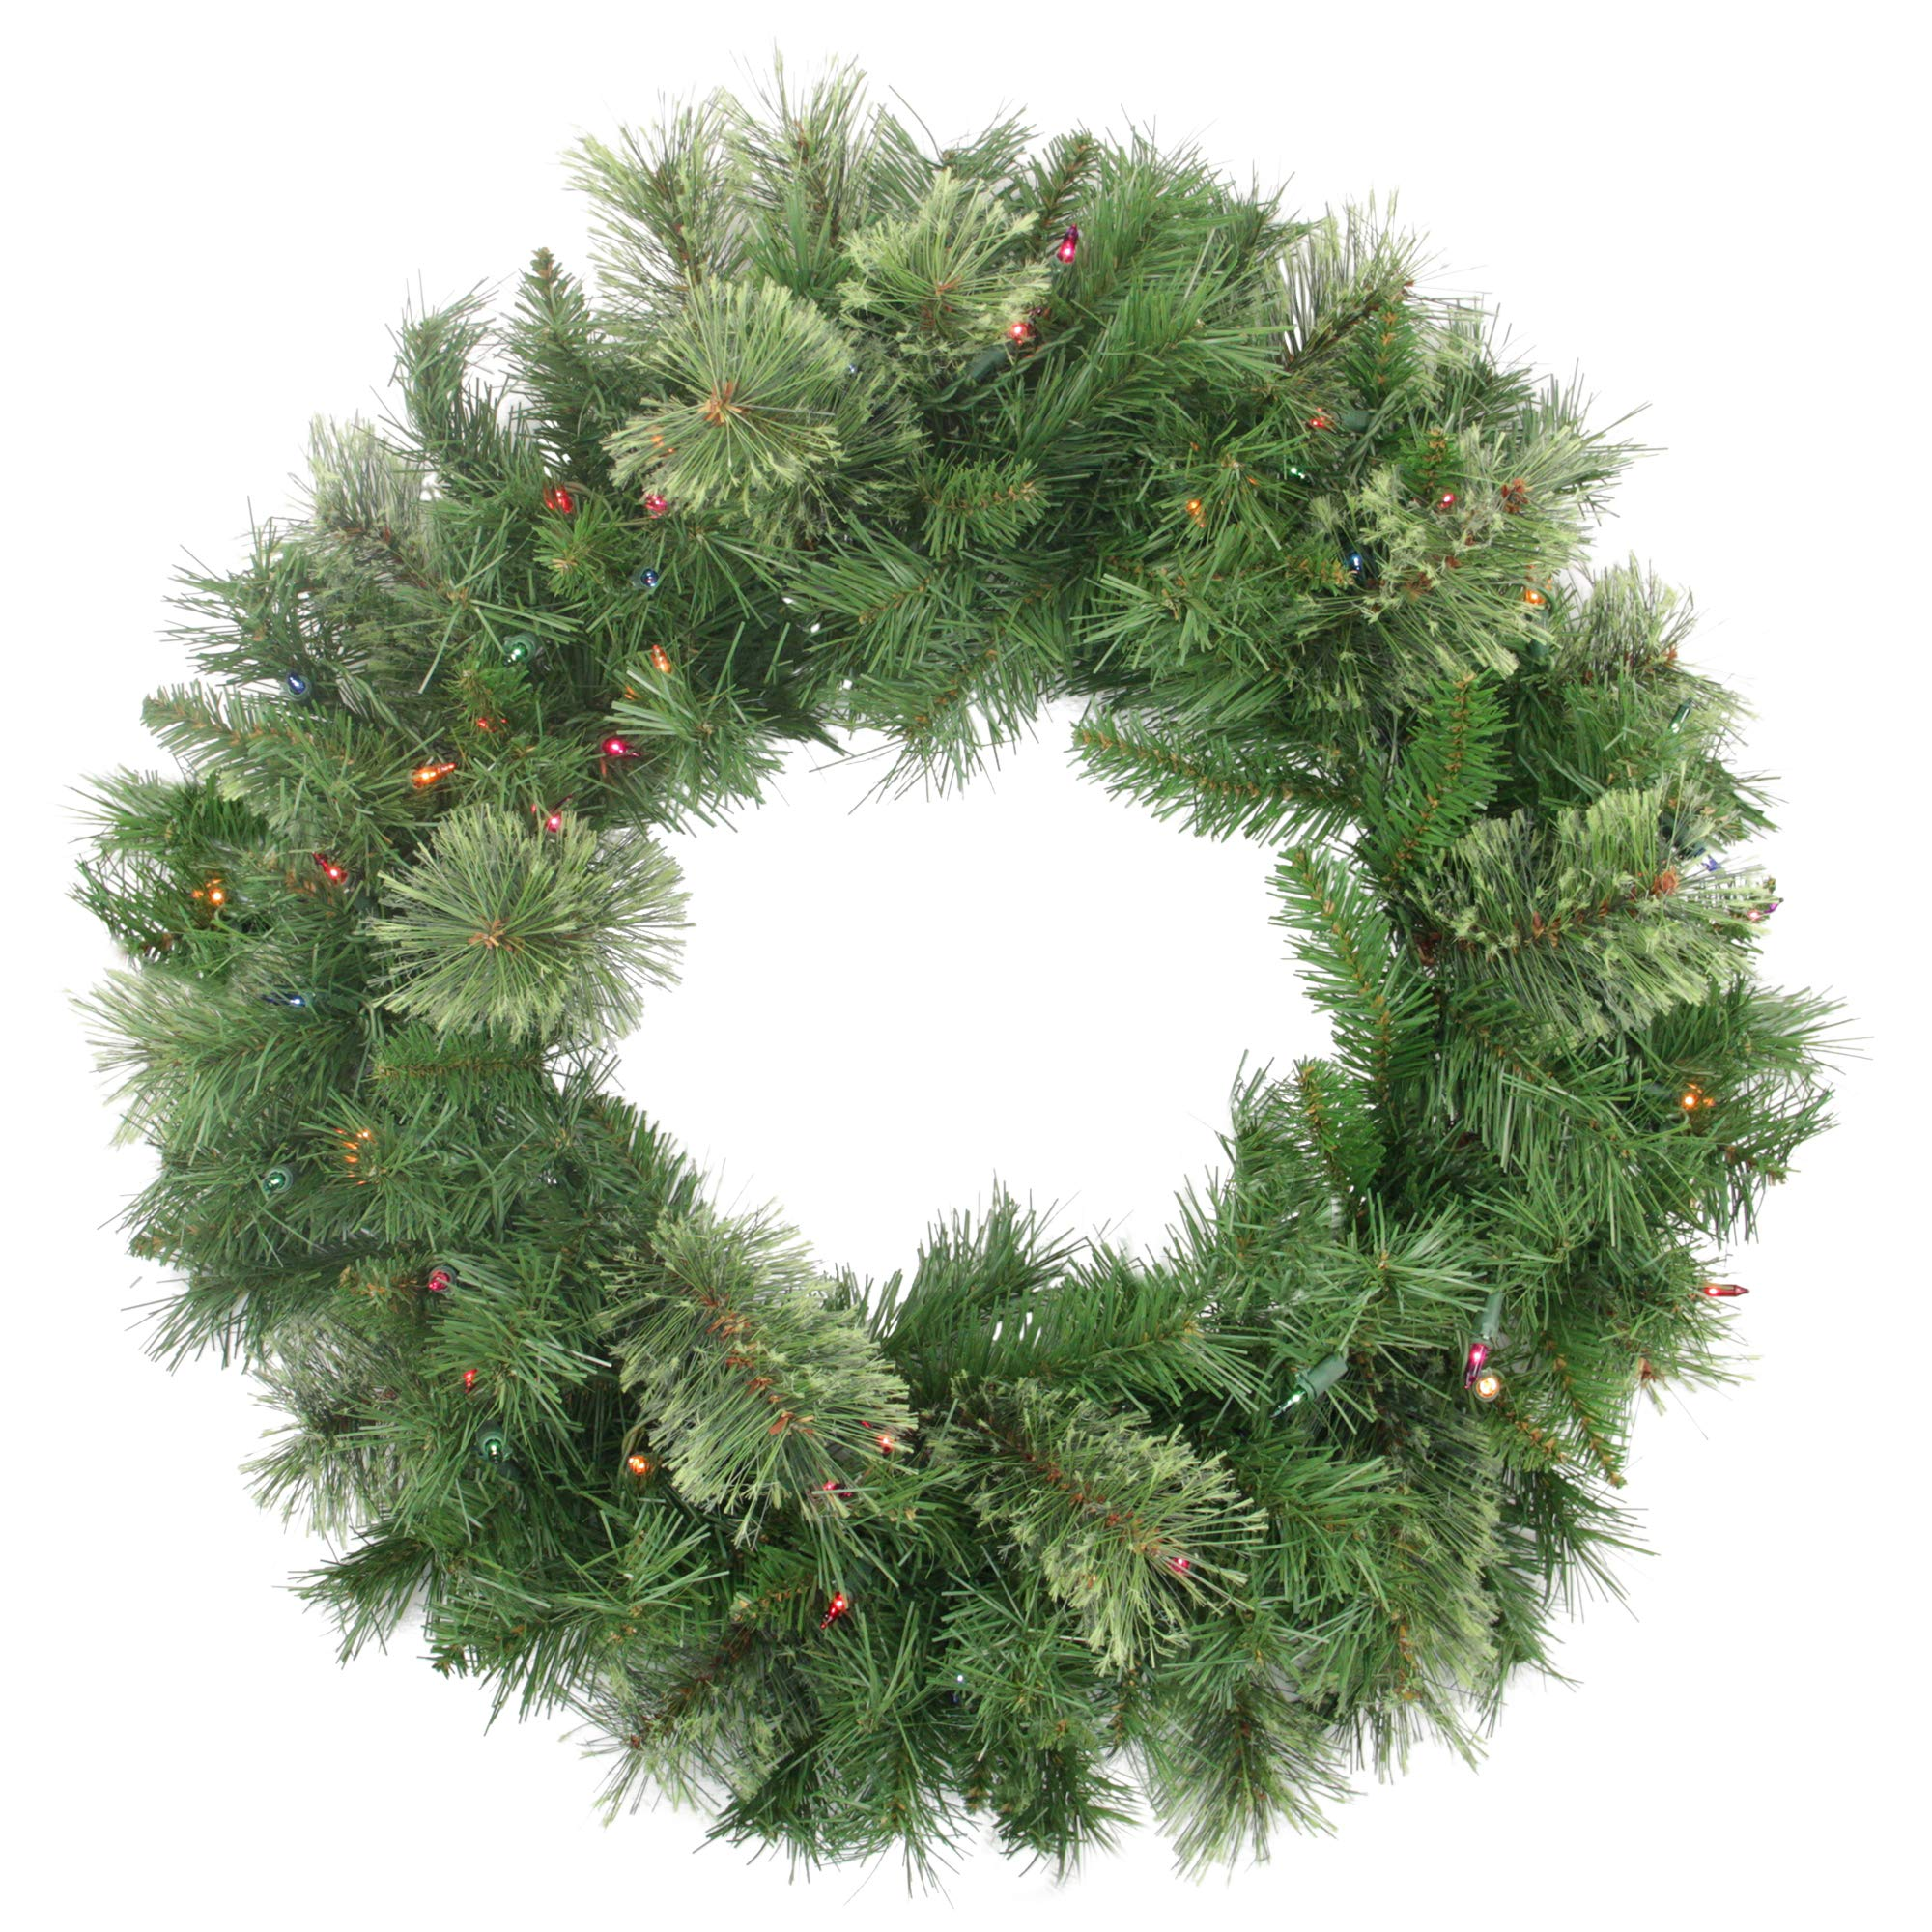 NORTHLIGHT Z84474 24'' Pre-Lit Atlanta Mixed Cashmere Pine Artificial Christmas Wreath-Multi-Color Lights